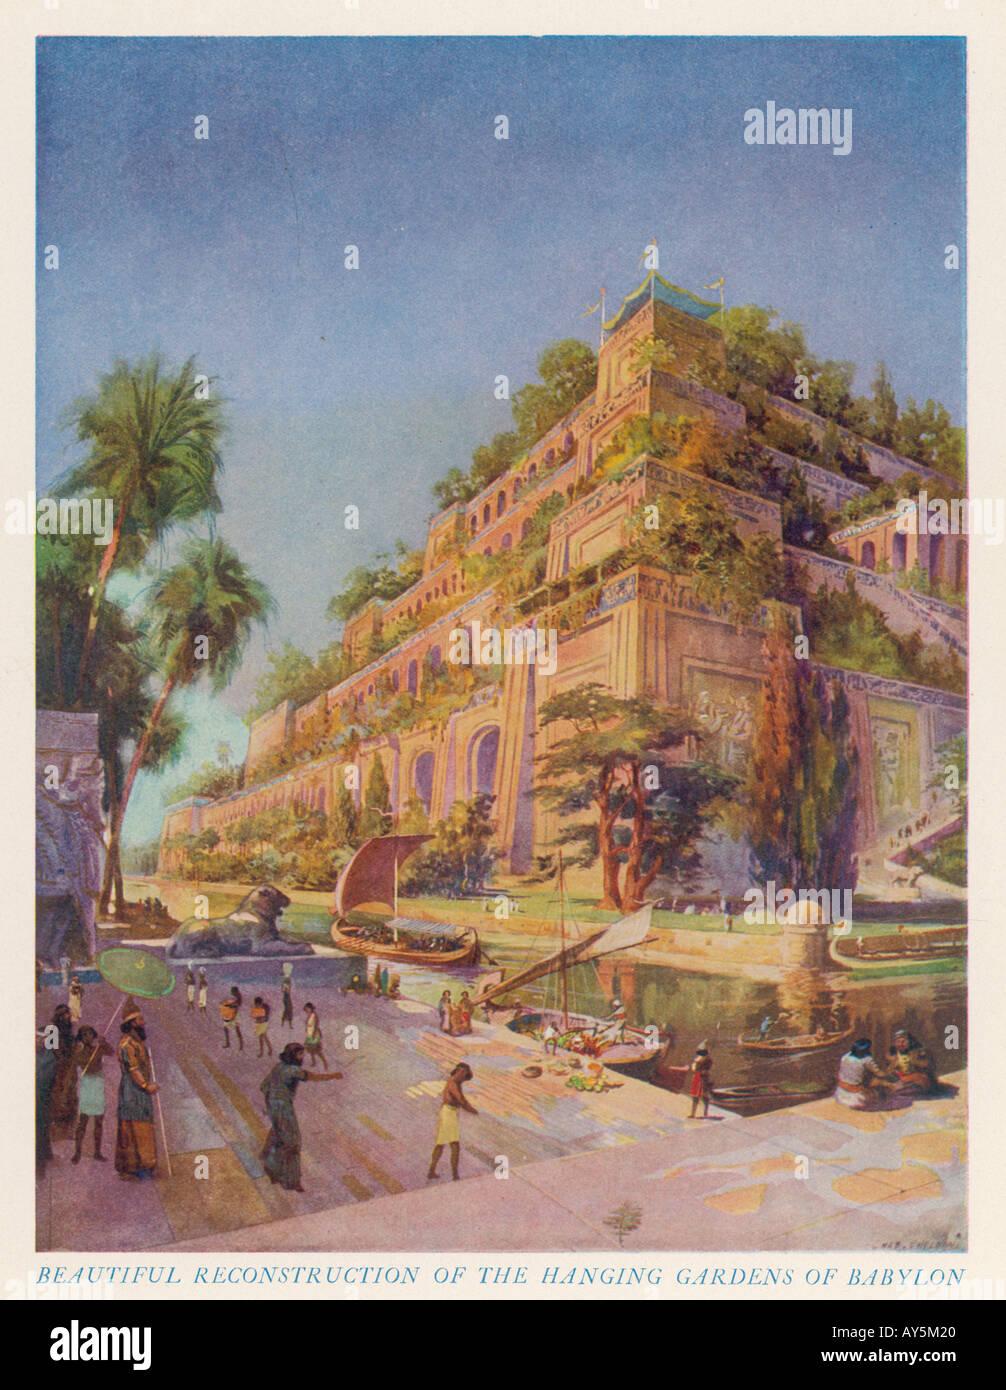 Jardines Colgantes De Babilonia Imagenes De Stock Jardines